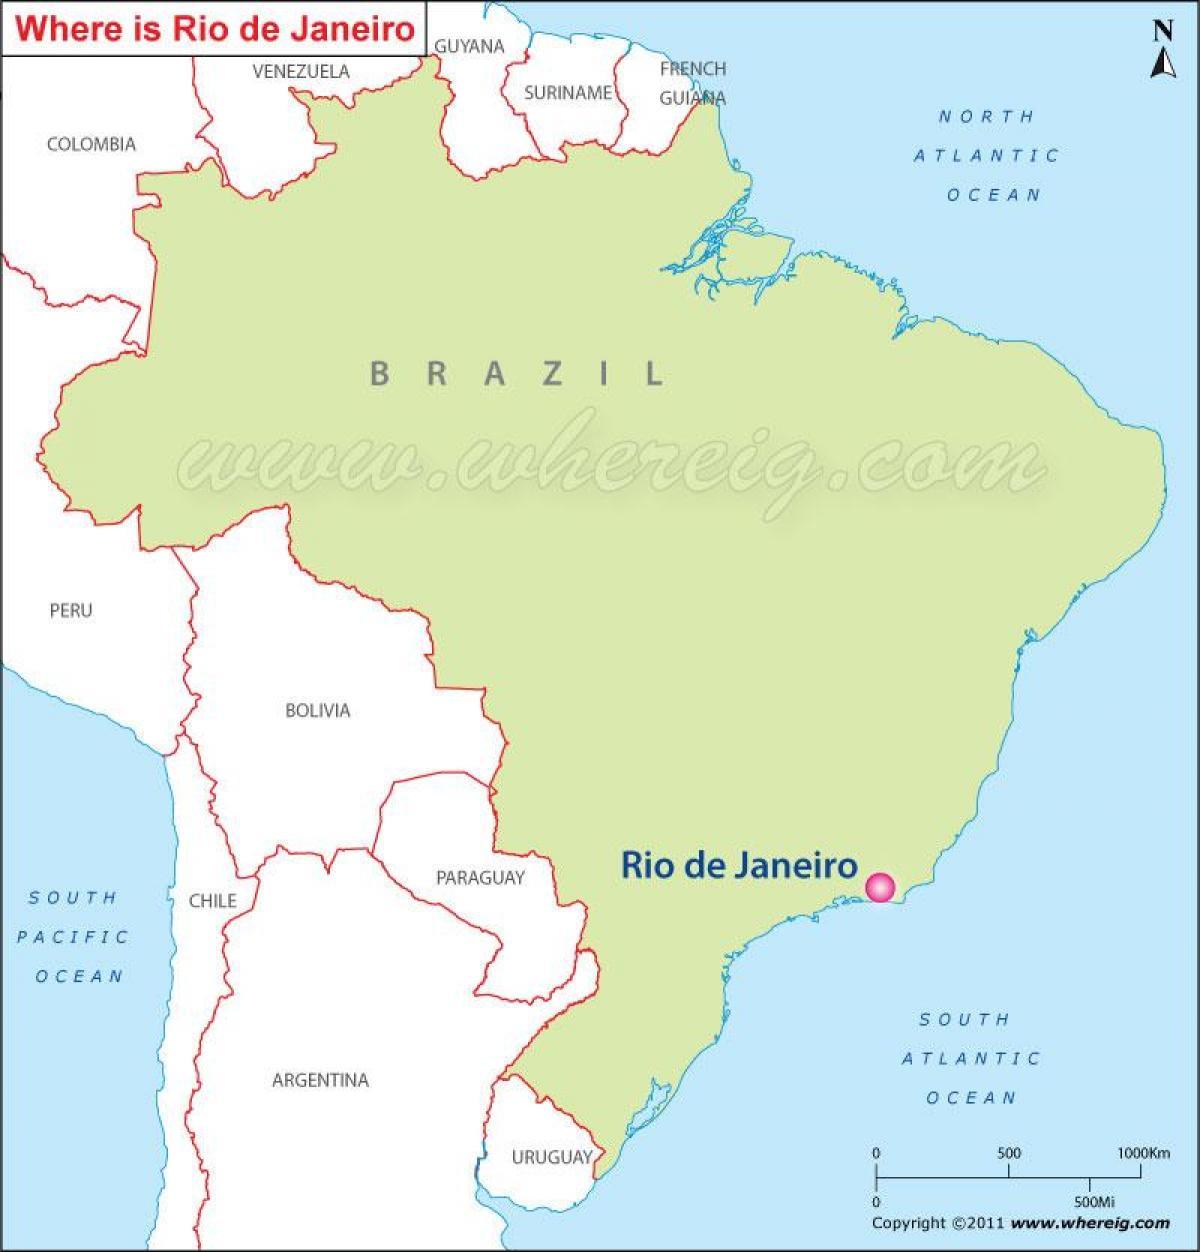 Rio de Janeiro Brasilien-map - Karte von Rio de Janeiro und ...